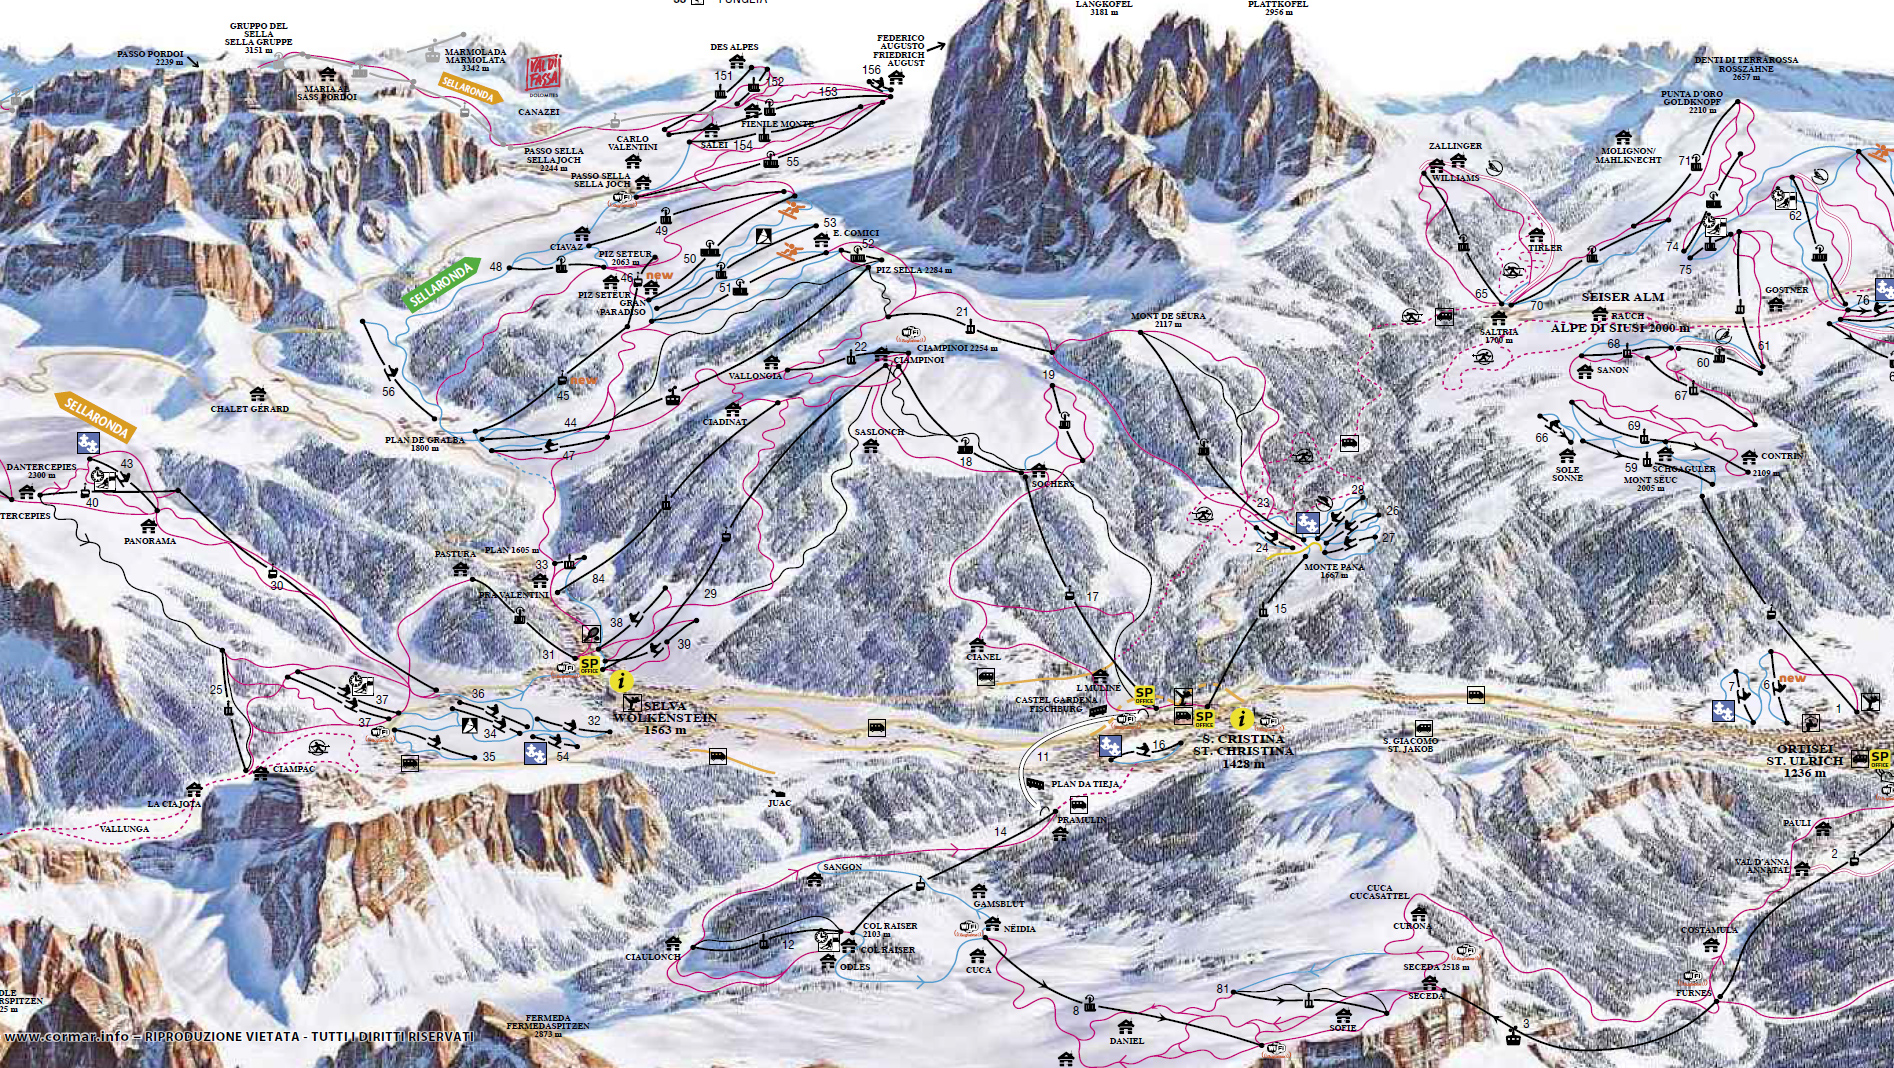 Cartina Santa Cristina - Mappa piste di sci Santa Cristina